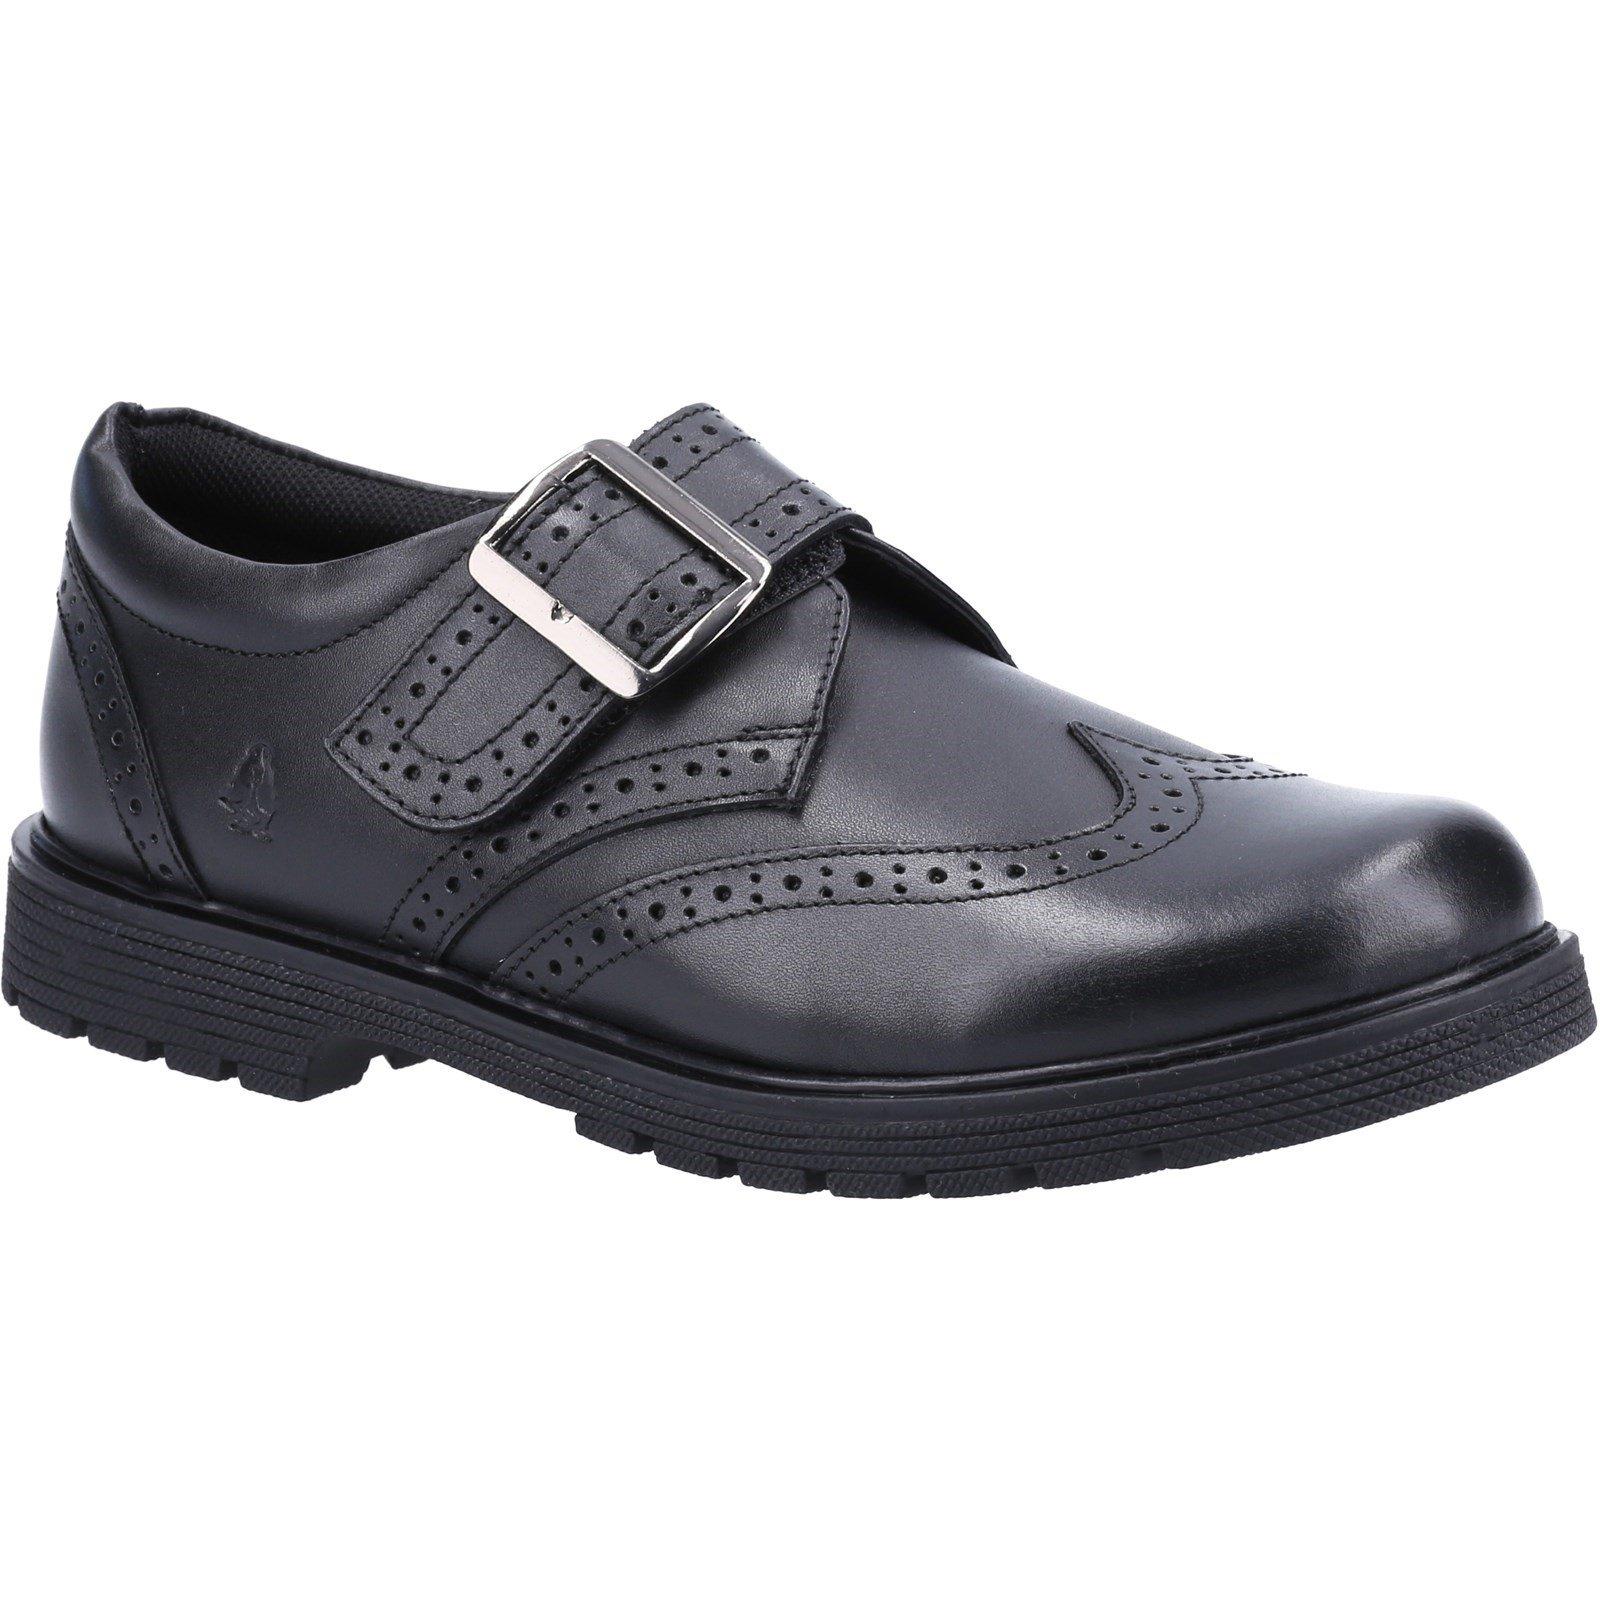 Hush Puppies Kid's Rhiannon Junior School Shoe Black 32625 - Black 10